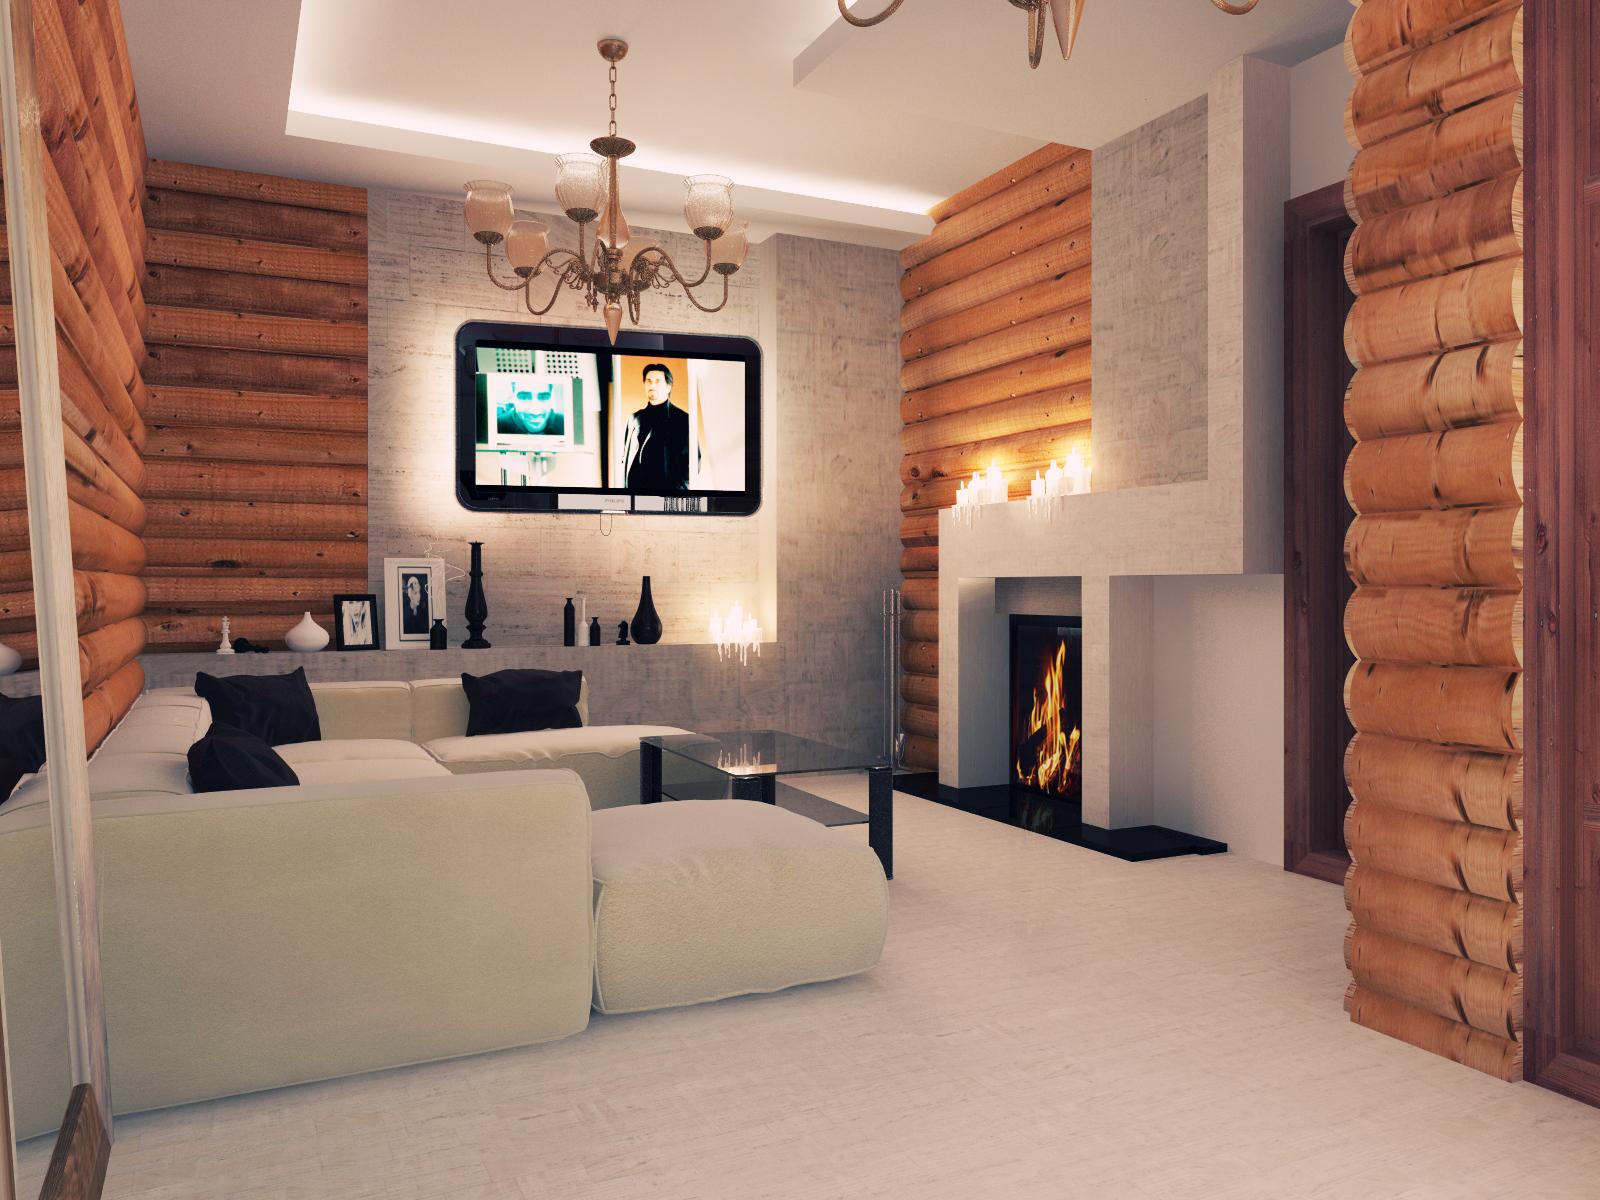 Блок хаус в интерьере дома фото